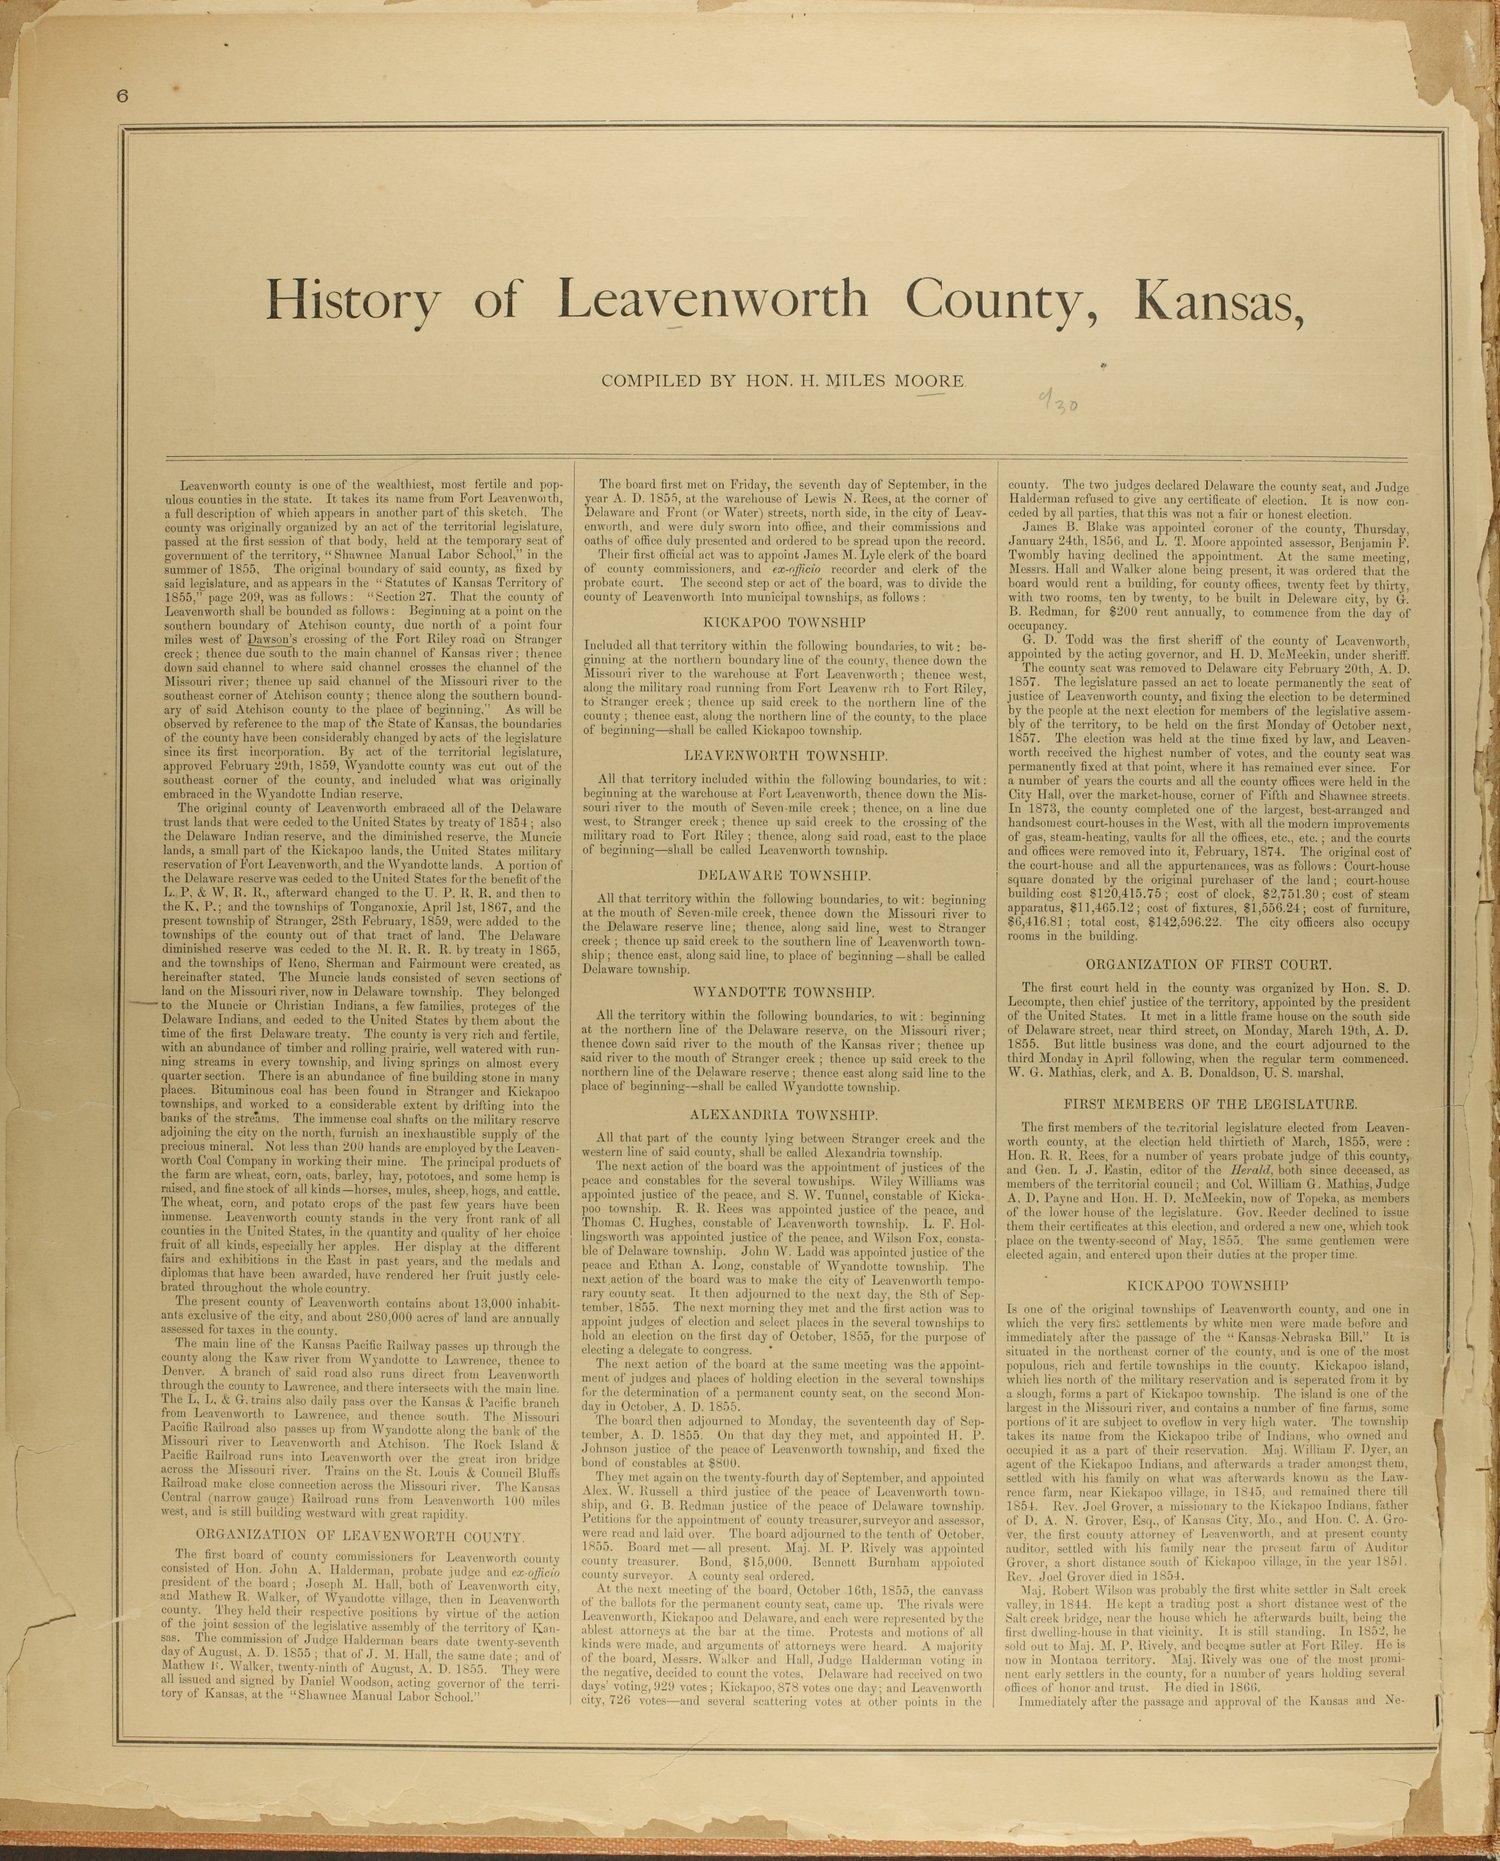 Atlas map of Leavenworth County, Kansas - 6